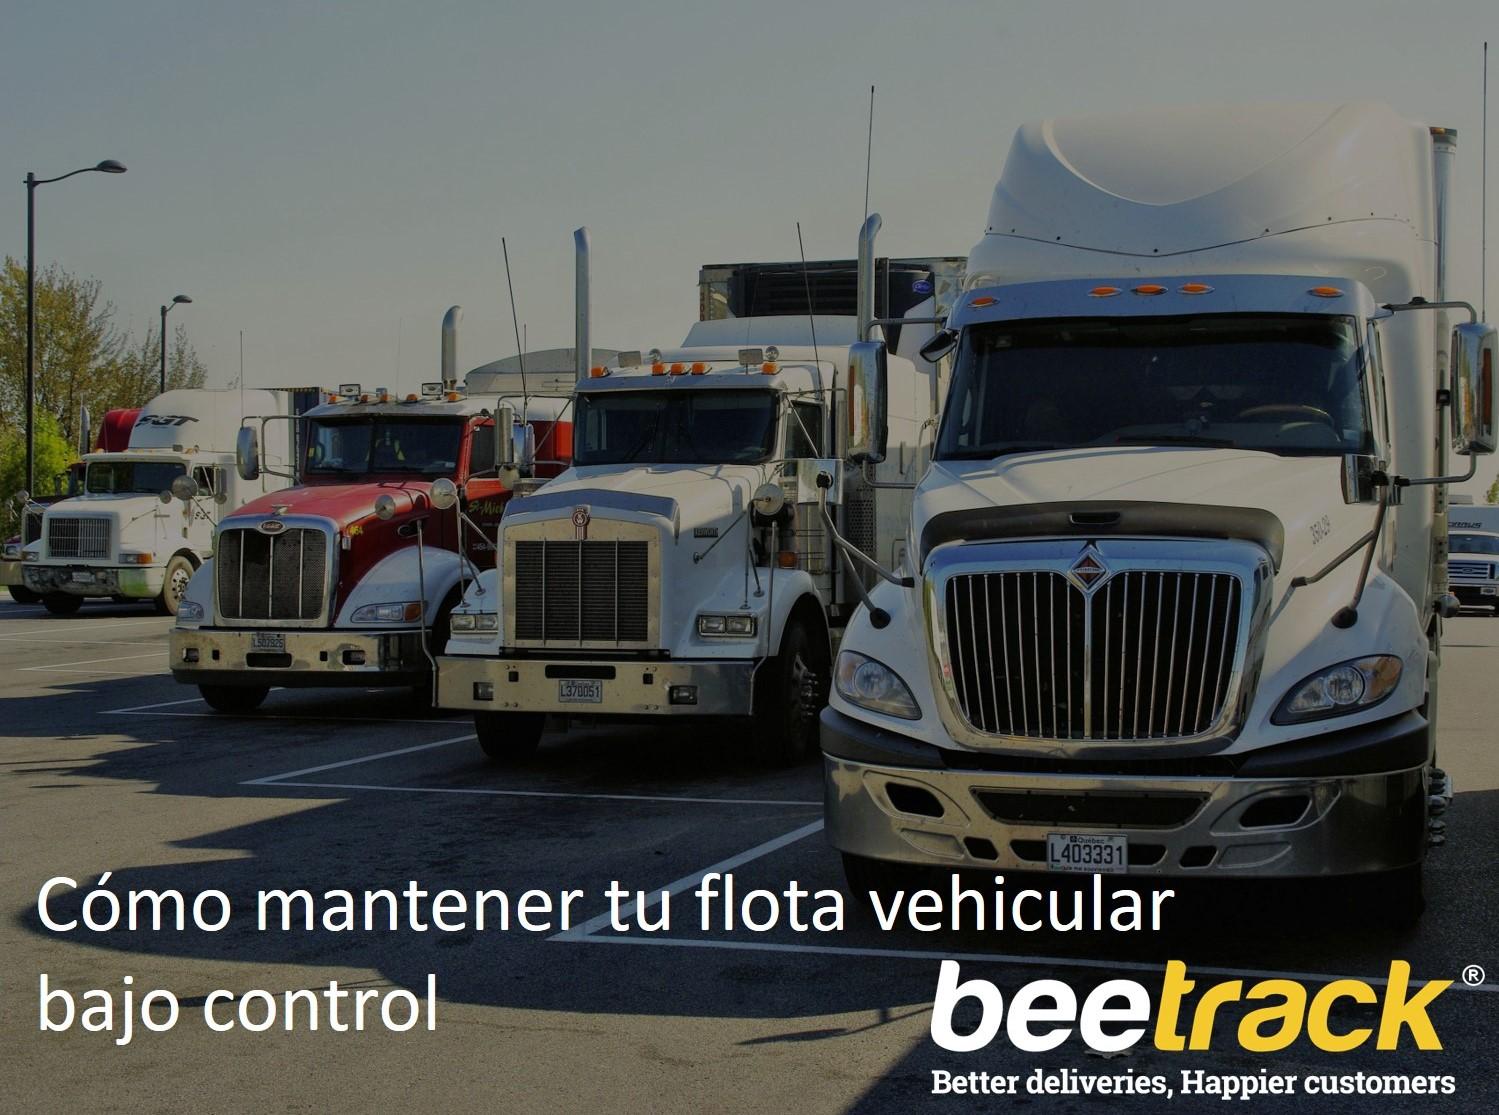 Cómo mantener tu flota vehicular bajo control.jpg